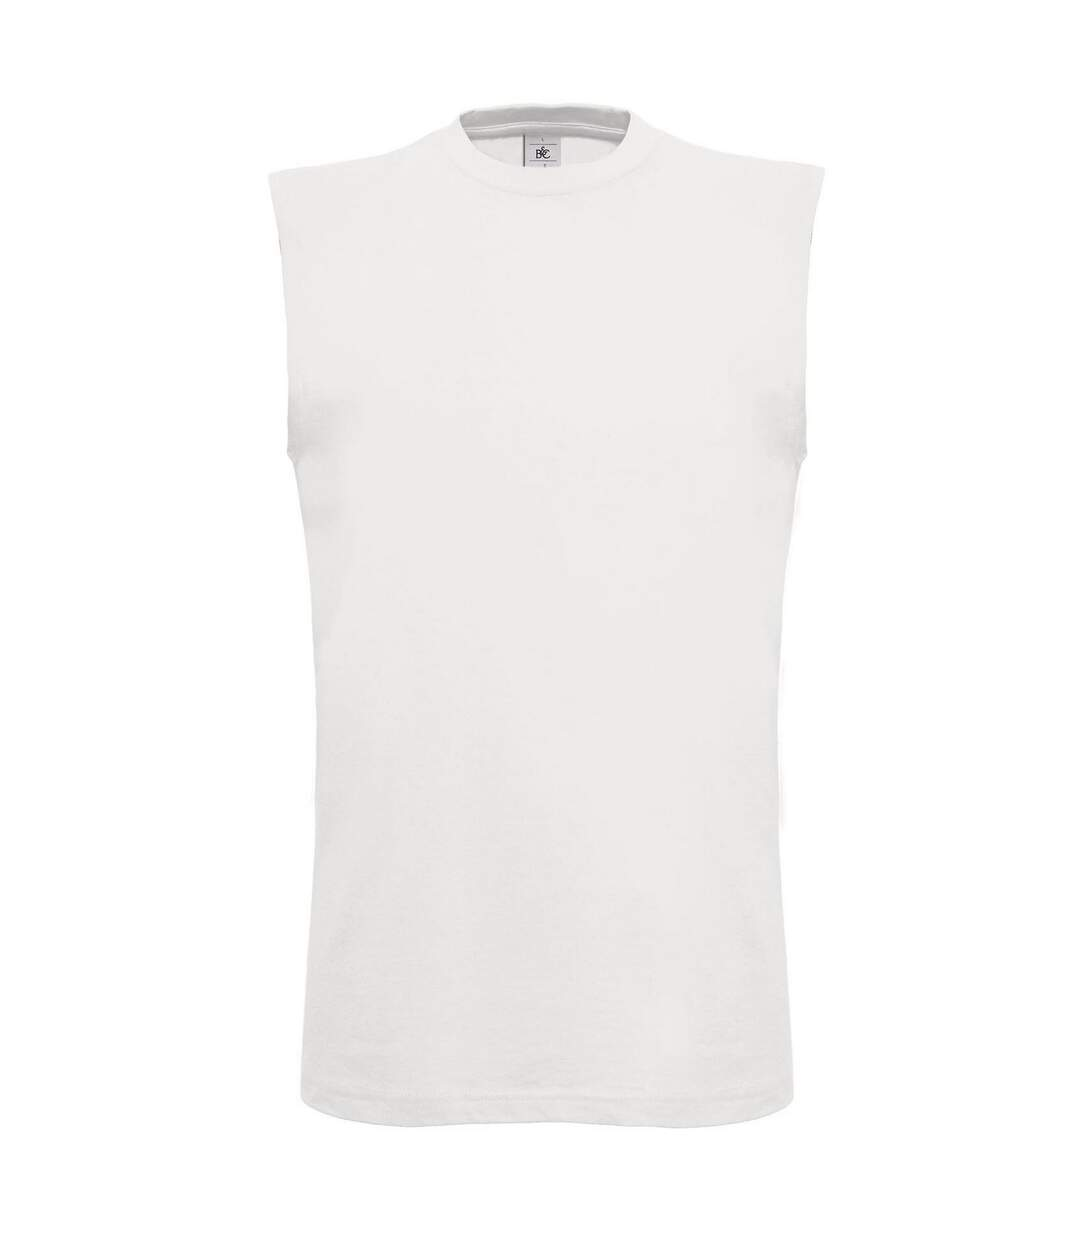 B&C Mens Exact Move Athletic Sleeveless Sports Vest Top (White) - UTRW3502